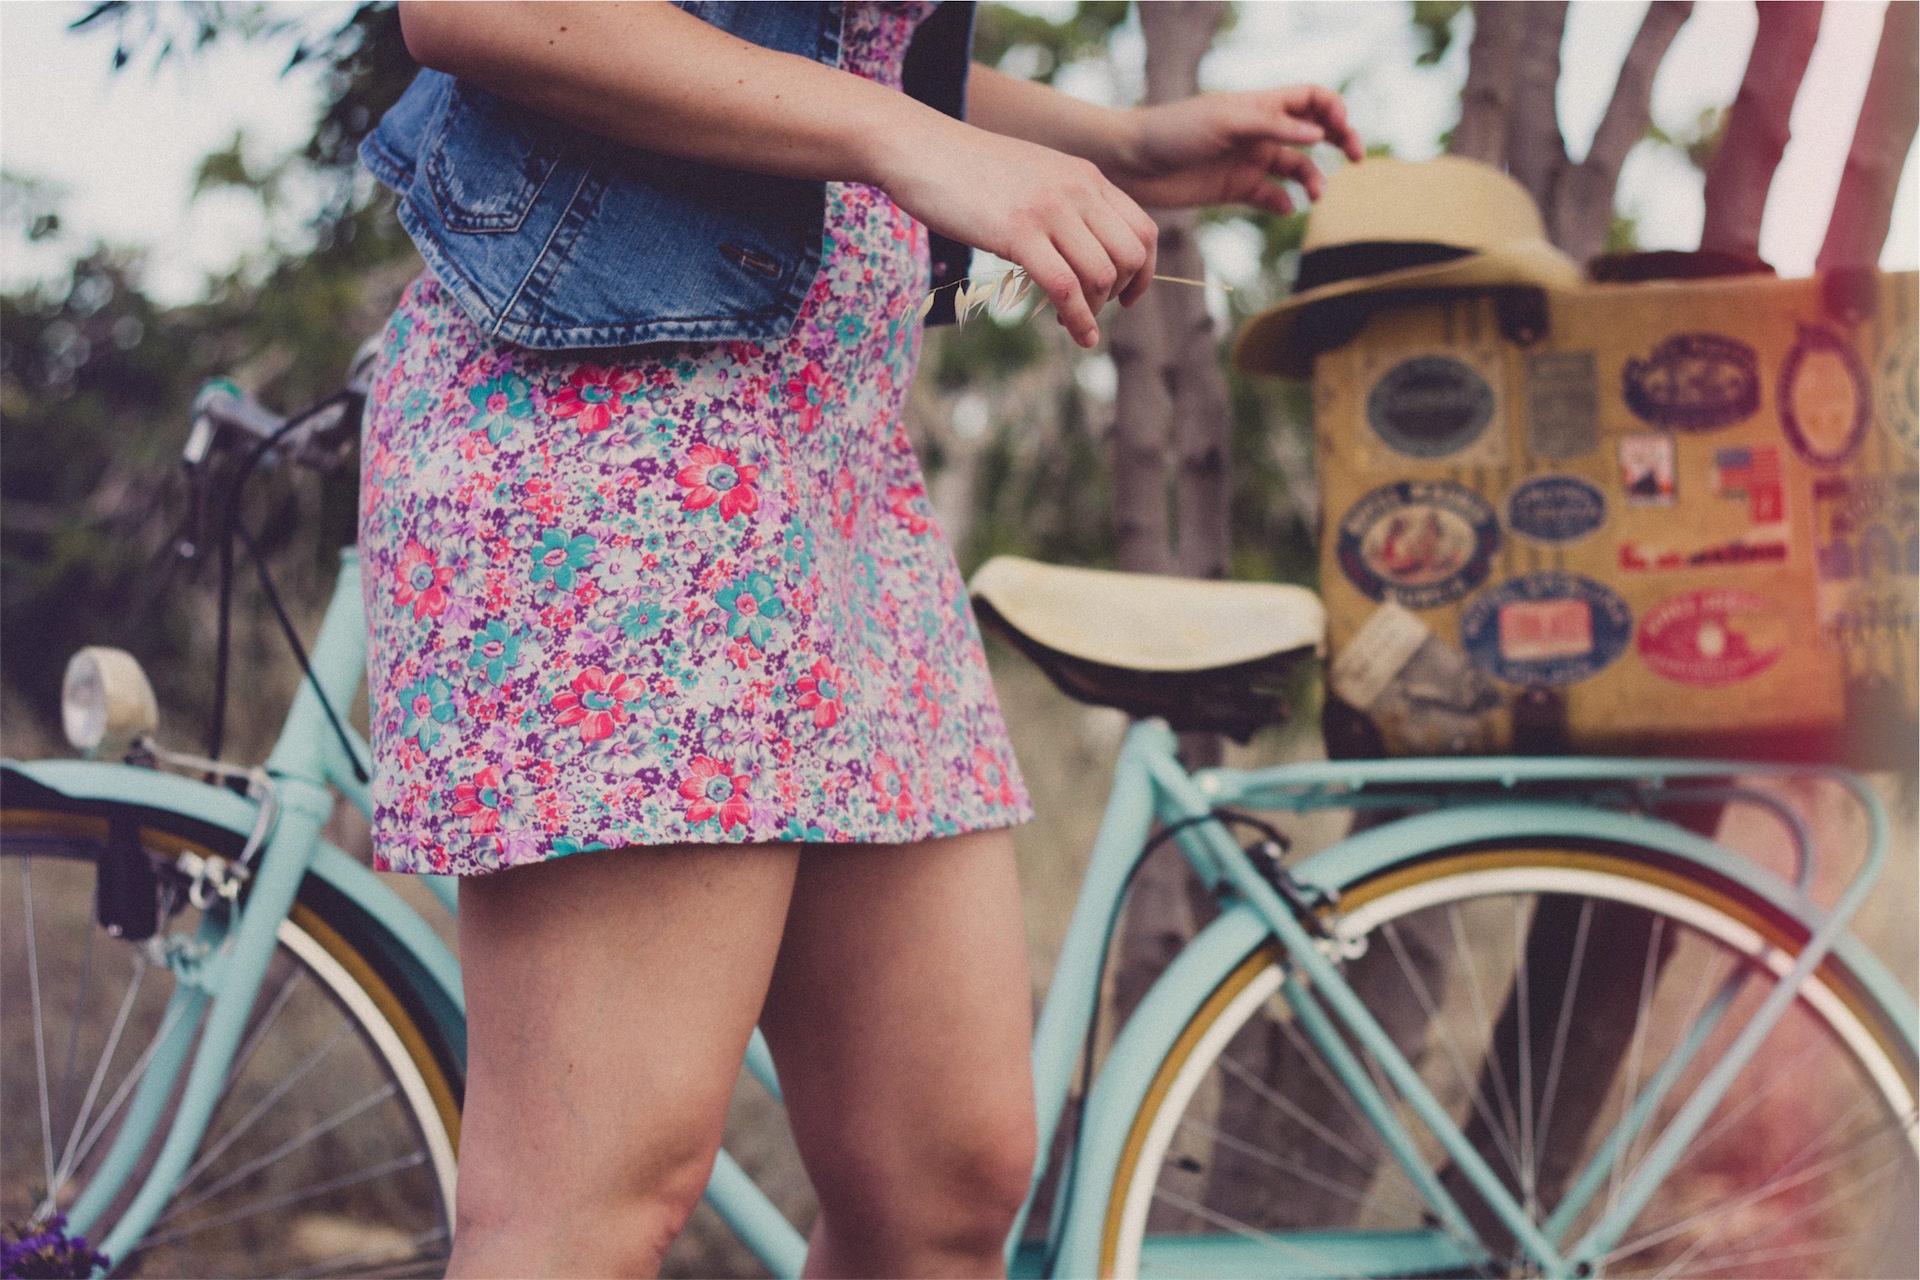 femme, vélo, jupe, boîte de, sombrero - Fonds d'écran HD - Professor-falken.com